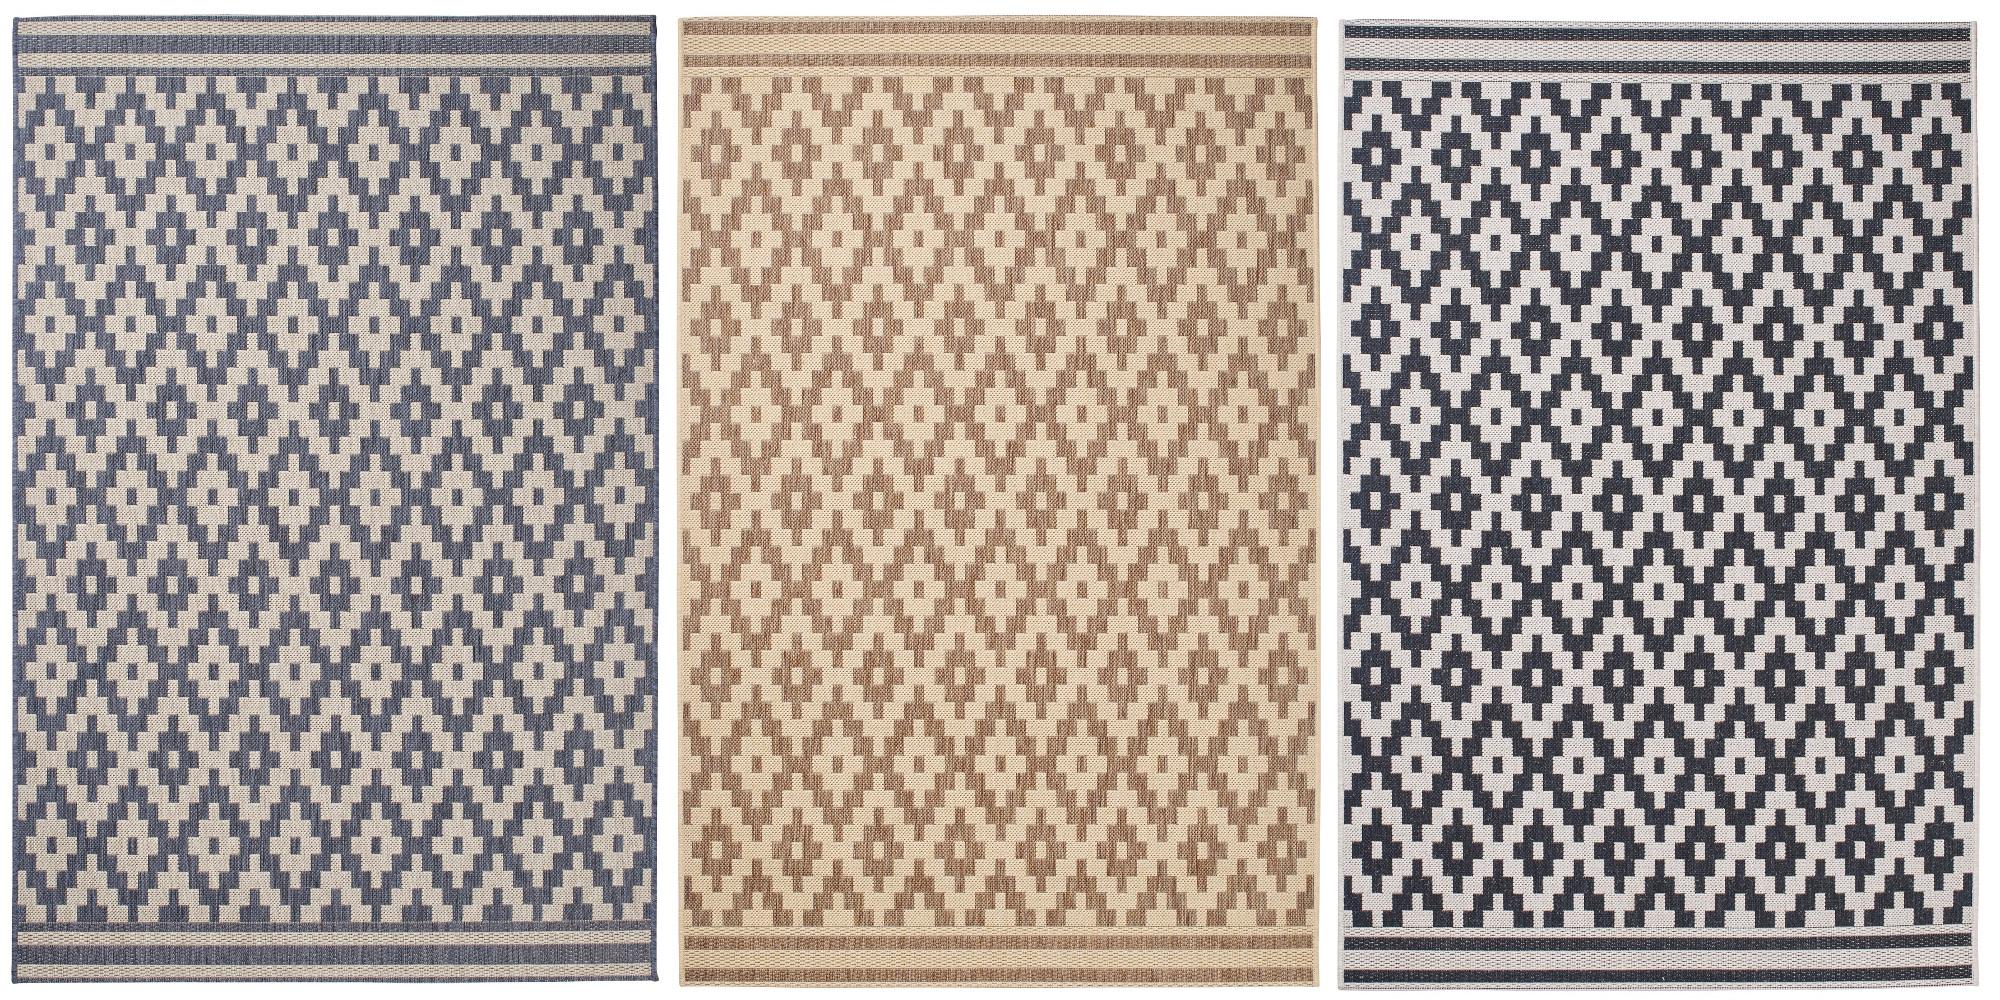 Diamond Design Rug Durable Flat Weave Polypropylene Stain Resistant Mat Home